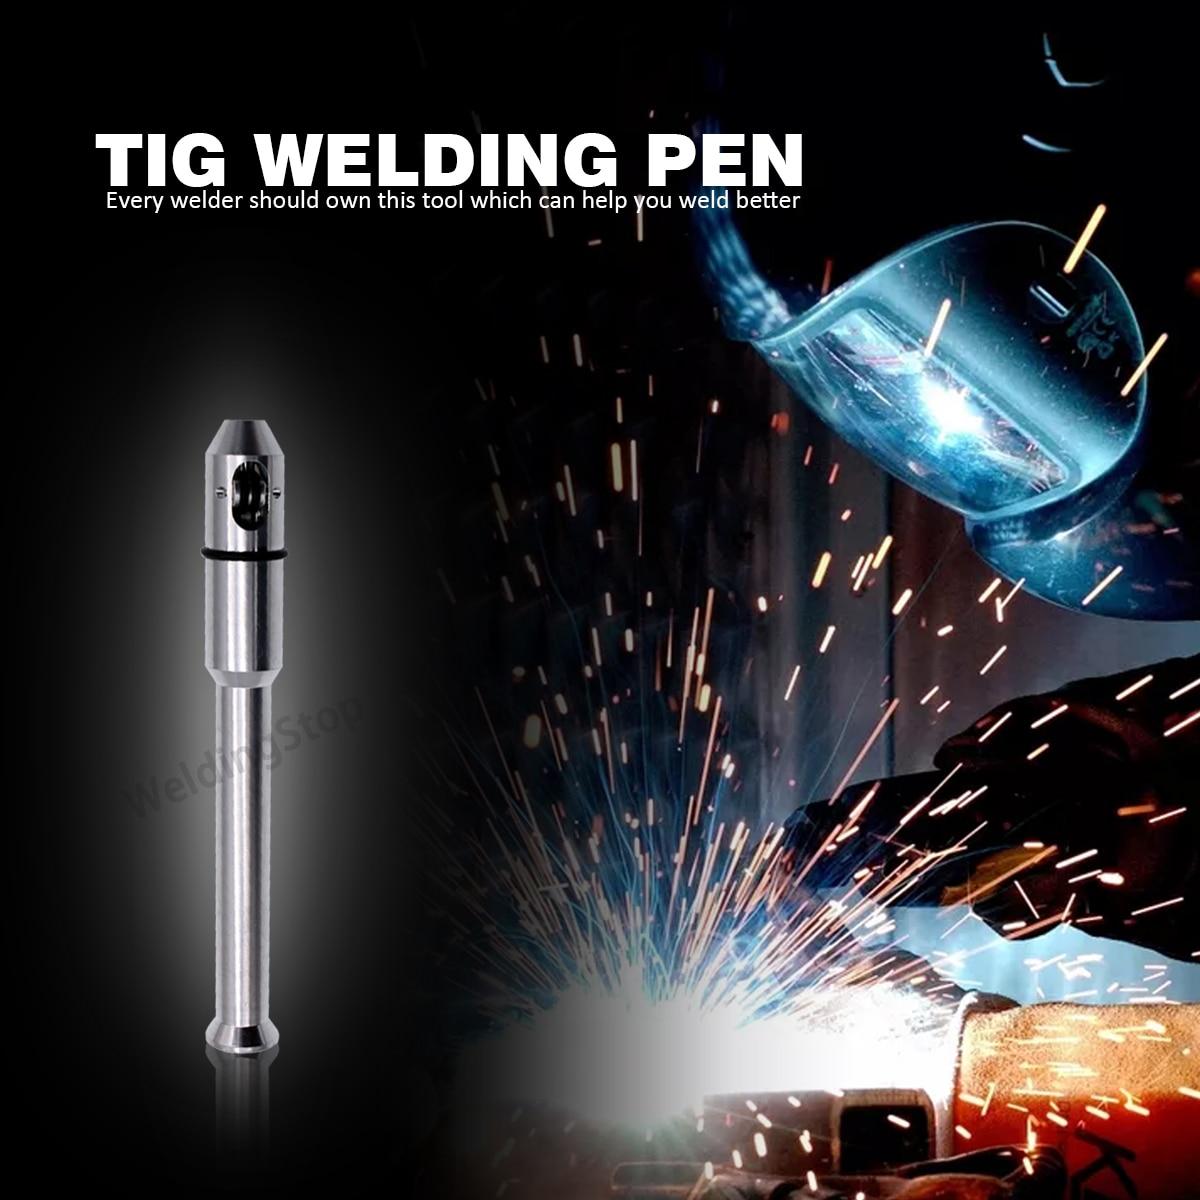 TIG Pen Finger Feeder Welding Rod Holder Filler Wire Pen 1.0-3.2mm (1/32''-1/8'') Welder Accessories